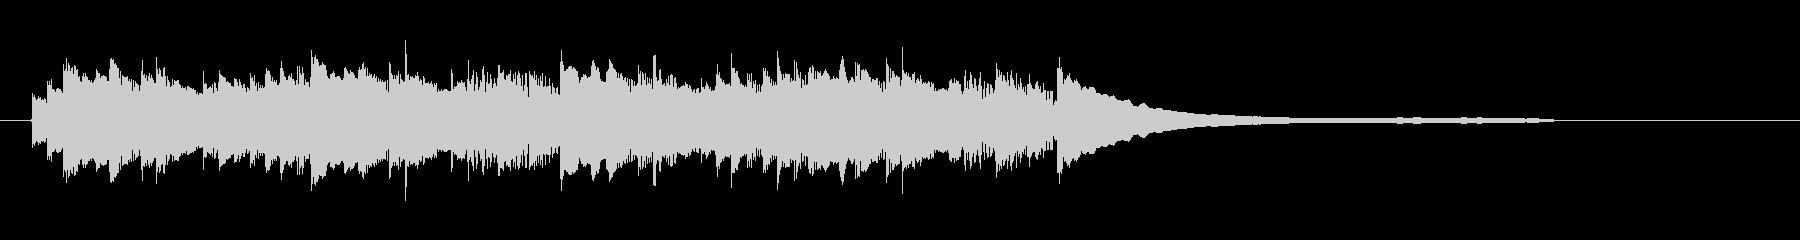 CM15秒/優しく感動的なピアノソロ26の未再生の波形